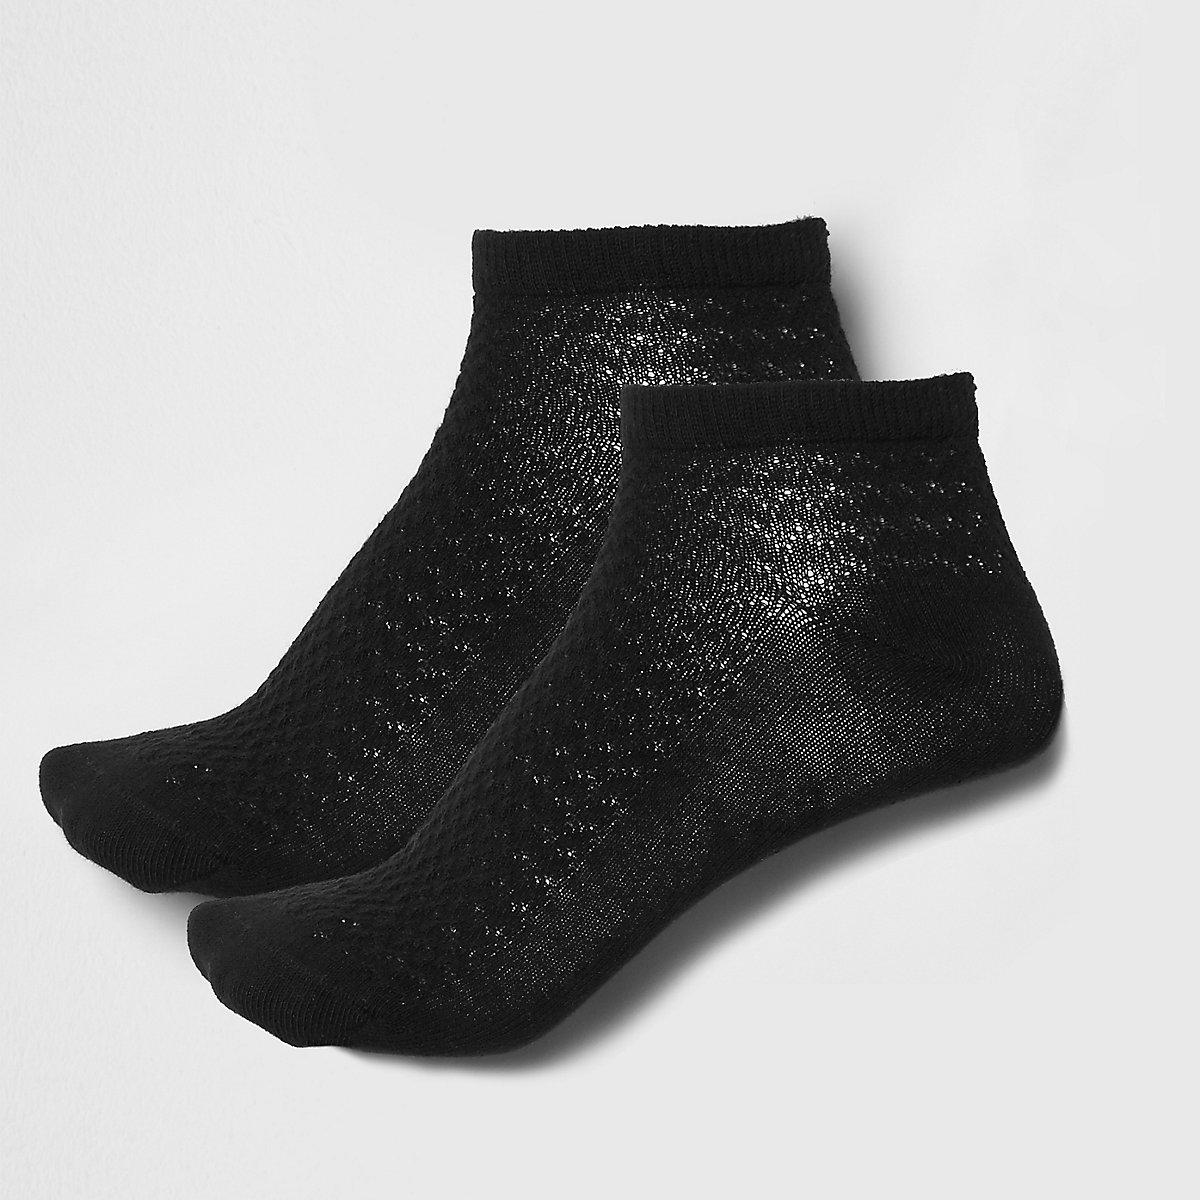 Black textured sneaker socks 2 pack